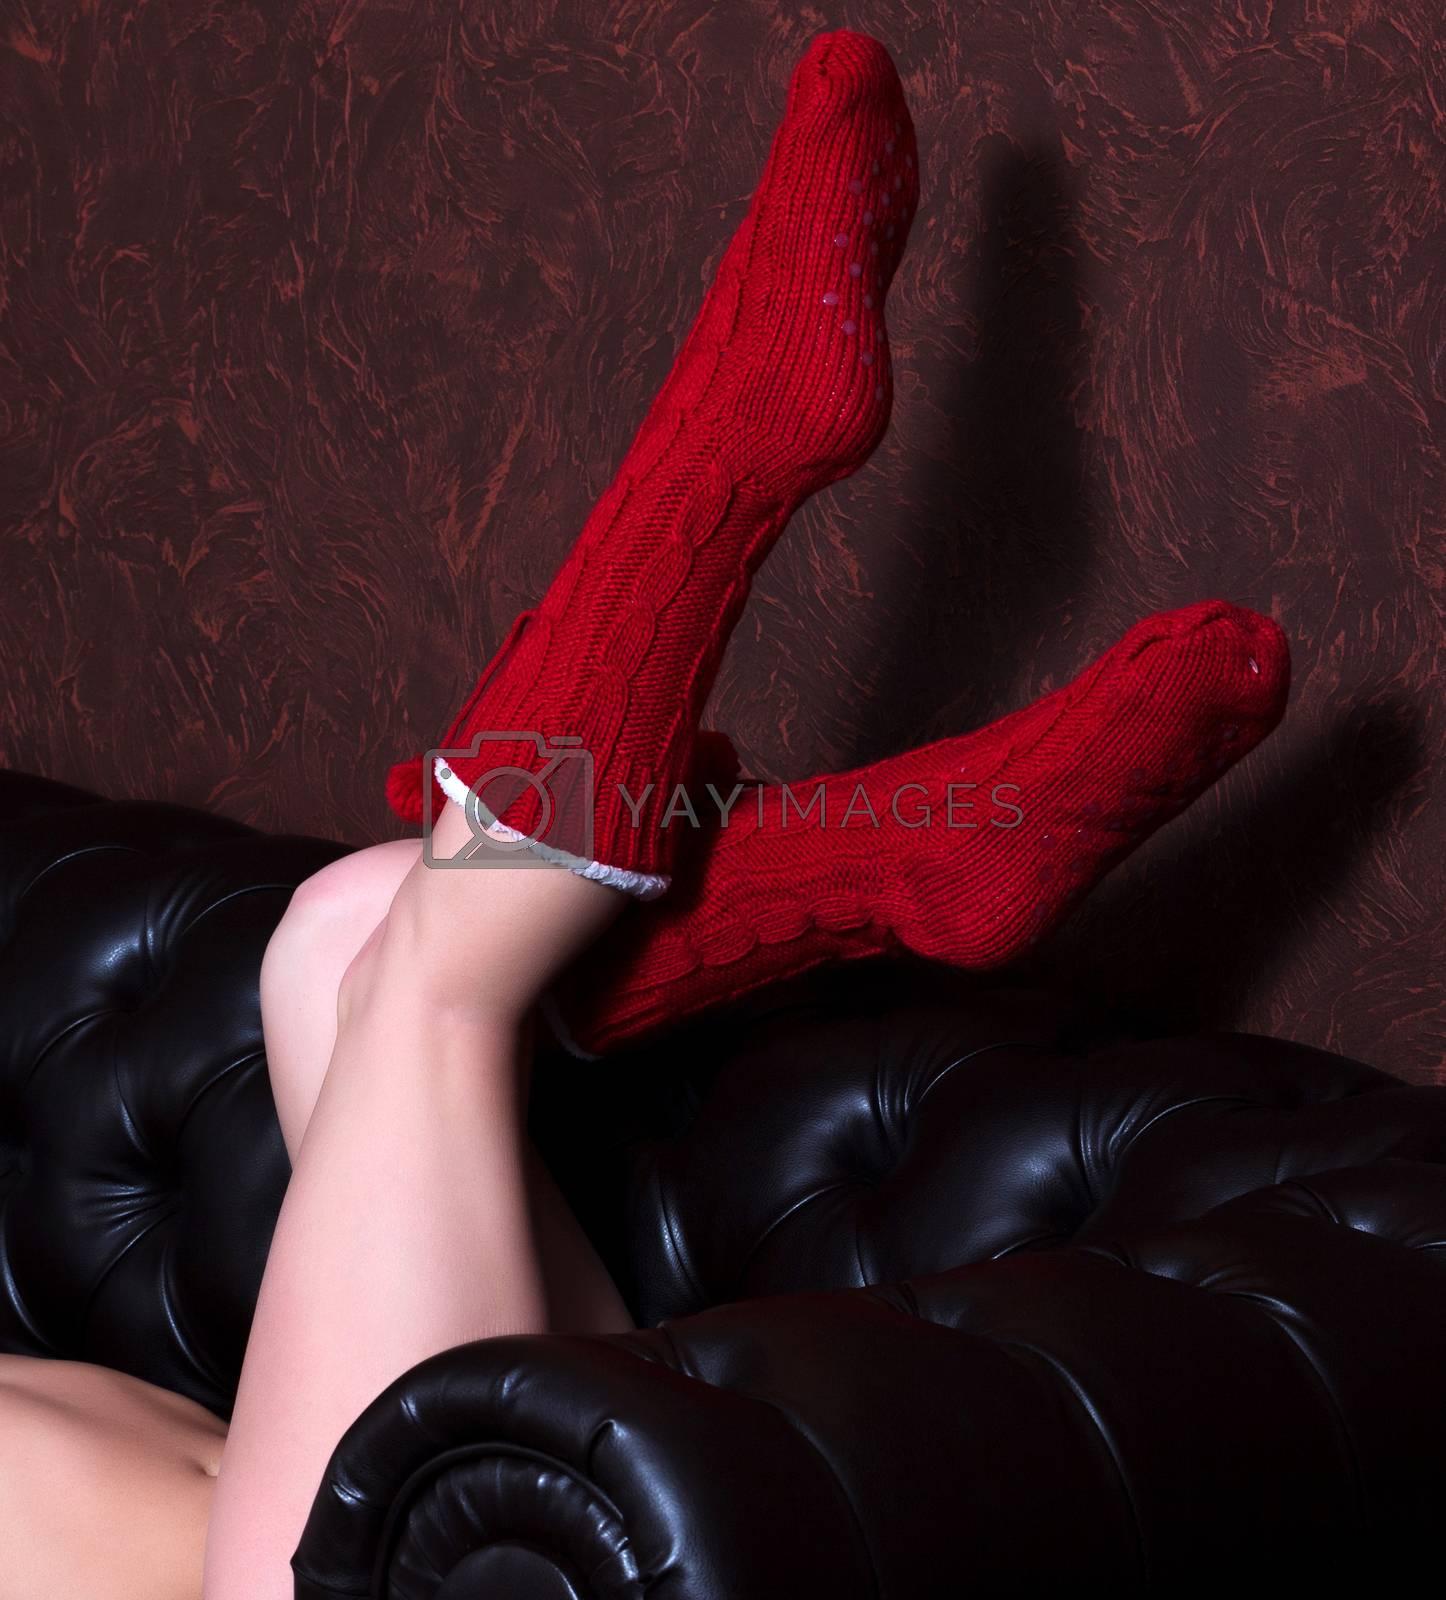 Female legs in red knitted socks